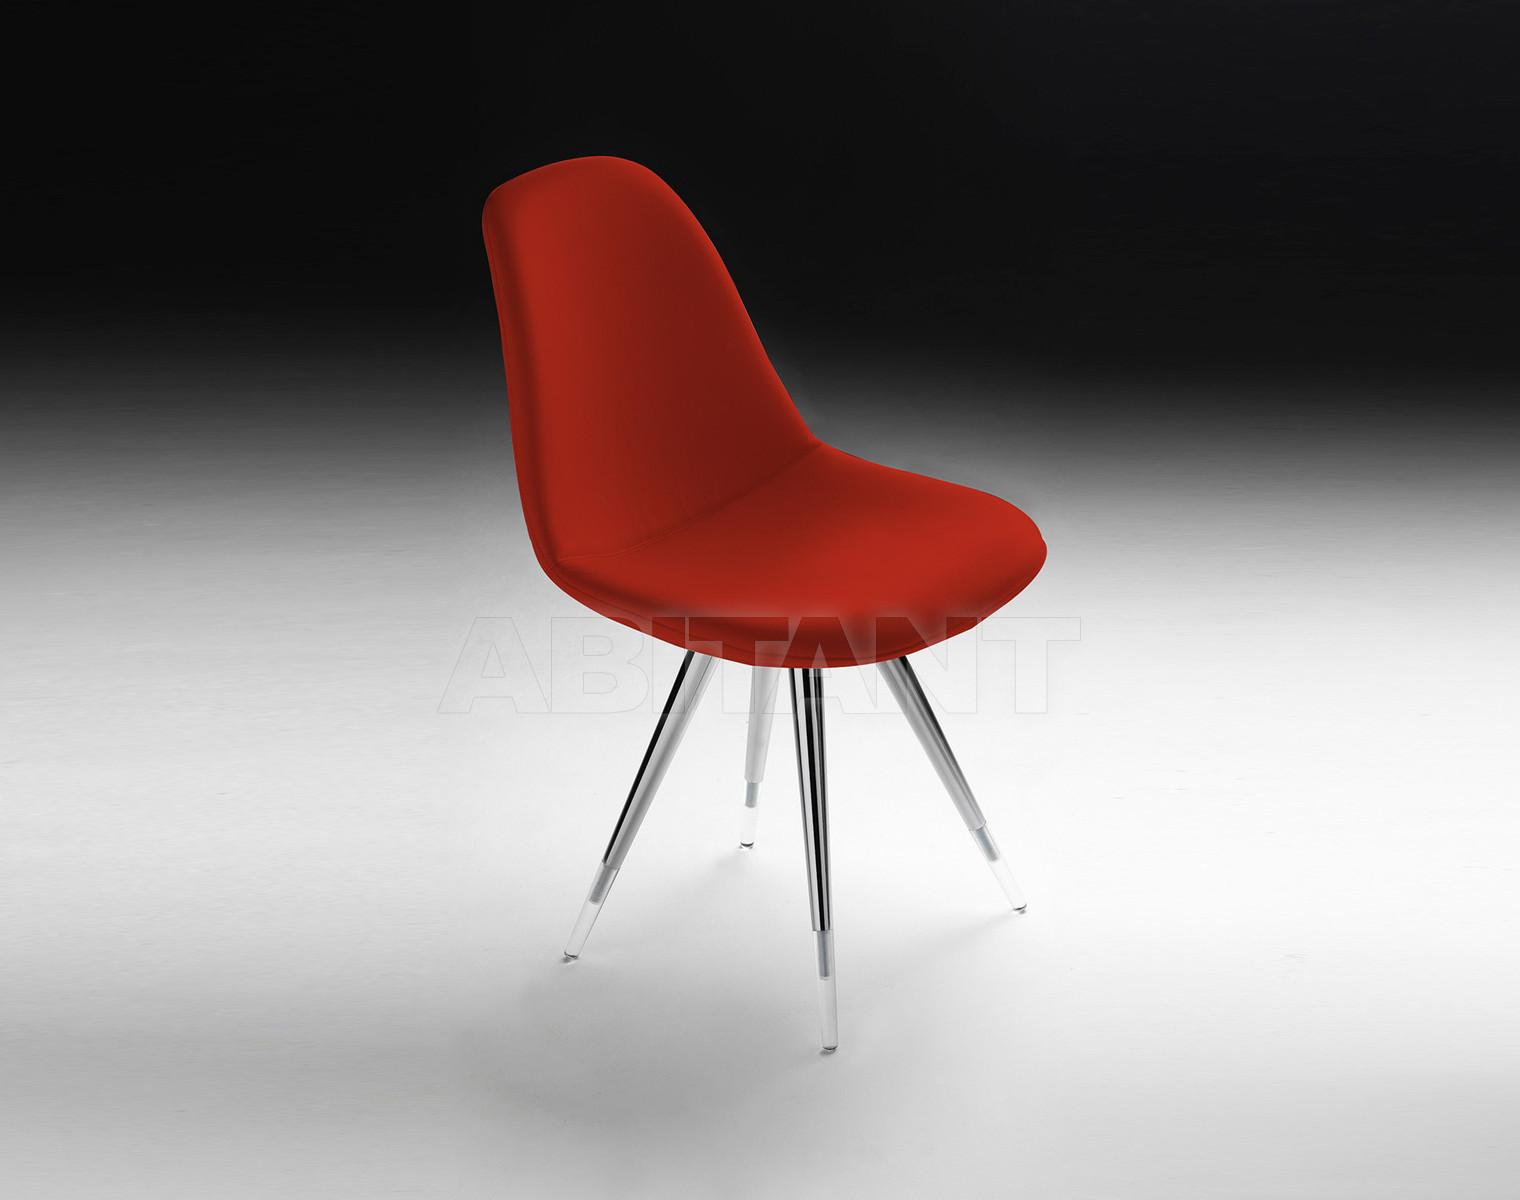 Купить Стул Kubikoff Gino Lemson & Ruud Bos Angel'POP'Chair' 11